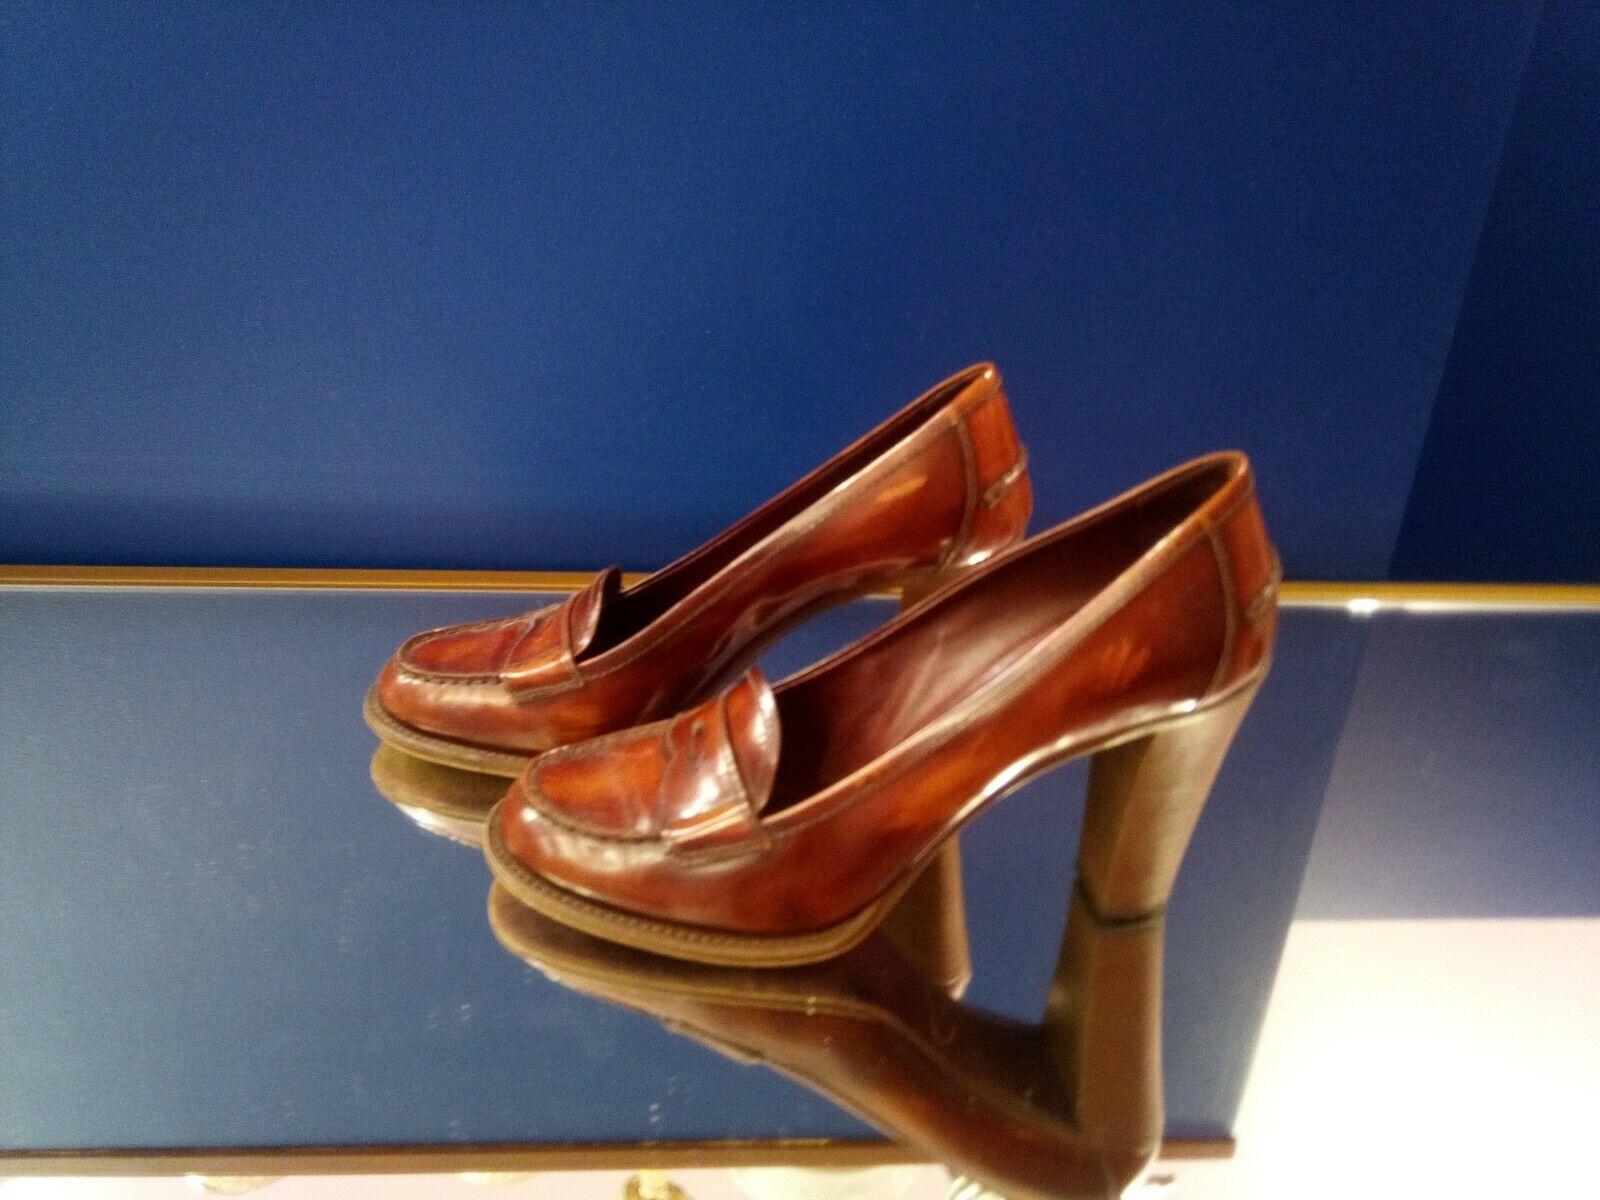 Auth Vintage PRADA högklackade skor Röd storlek 40 uk 8 us 10